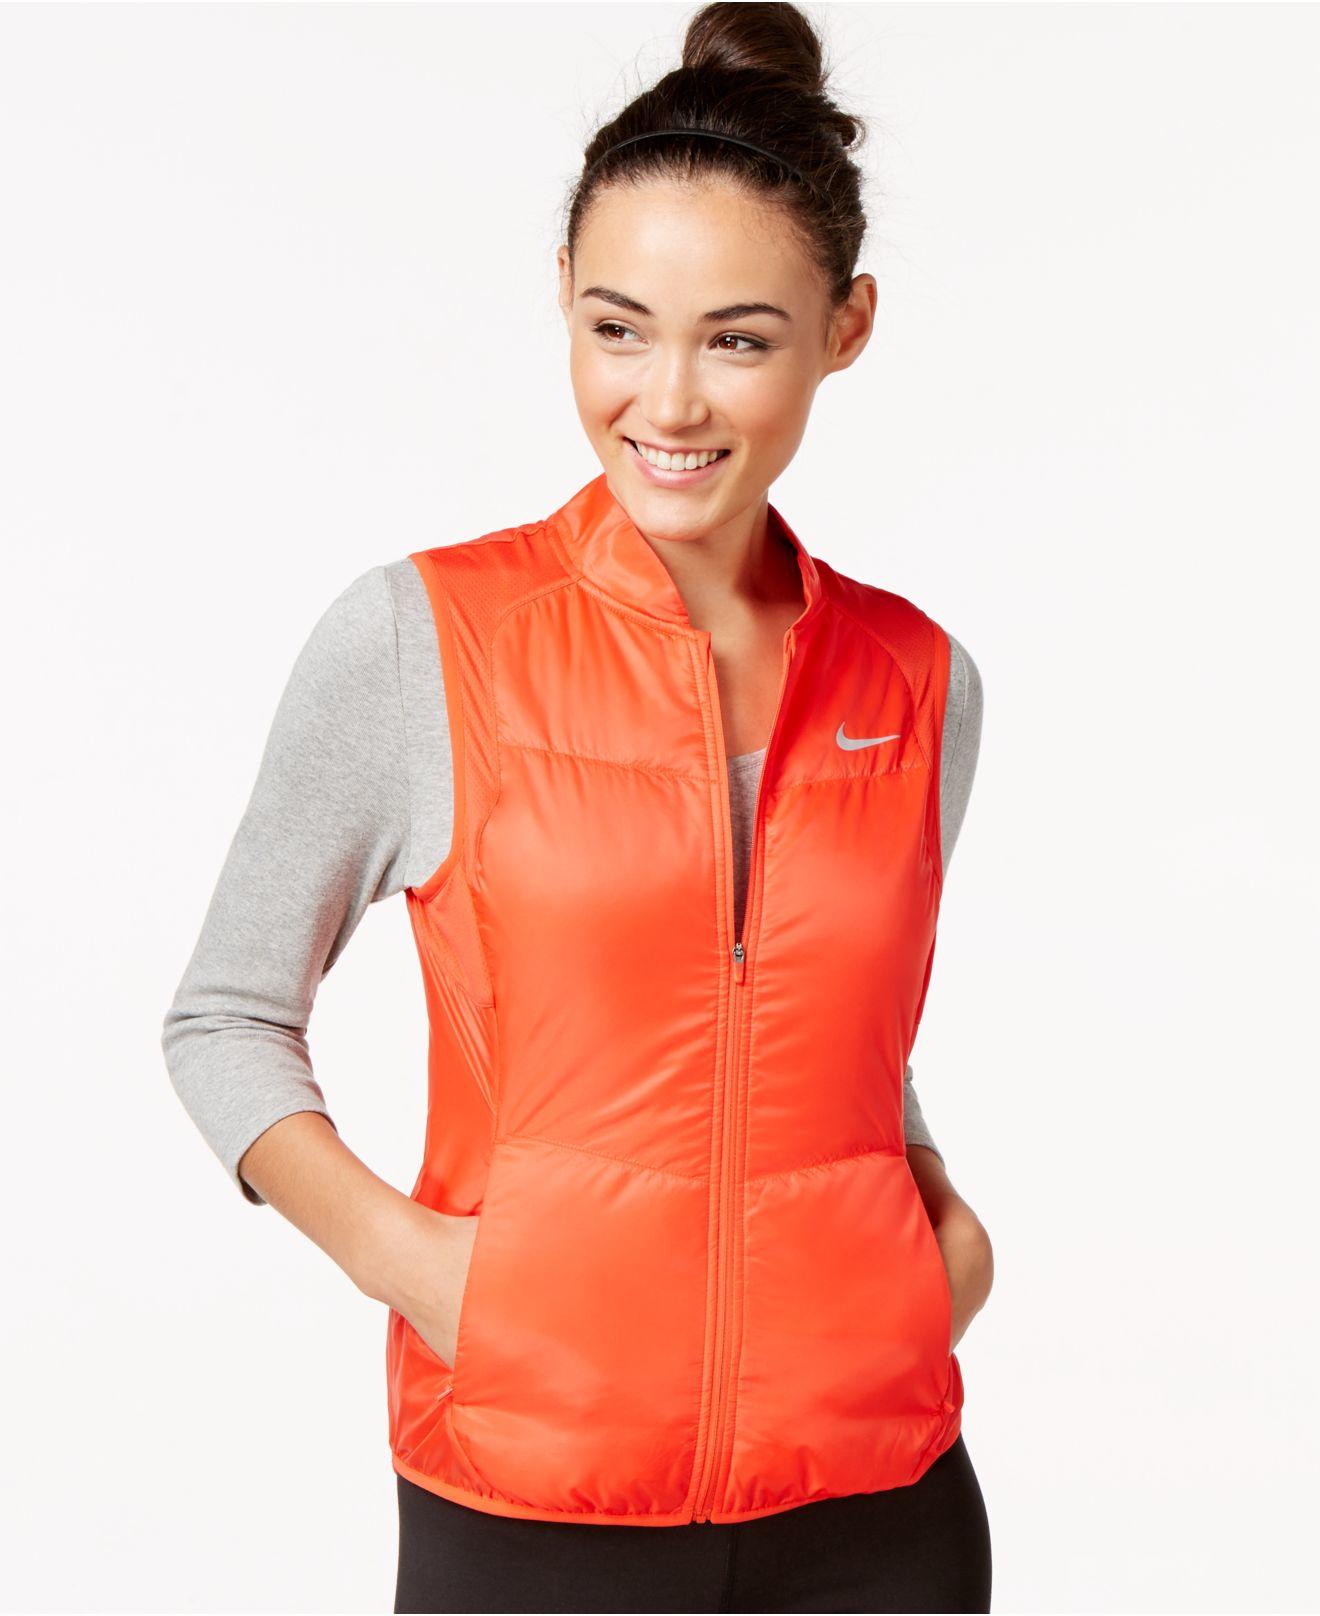 8e4ff247c3bc Lyst - Nike Polyfill Running Vest in Orange